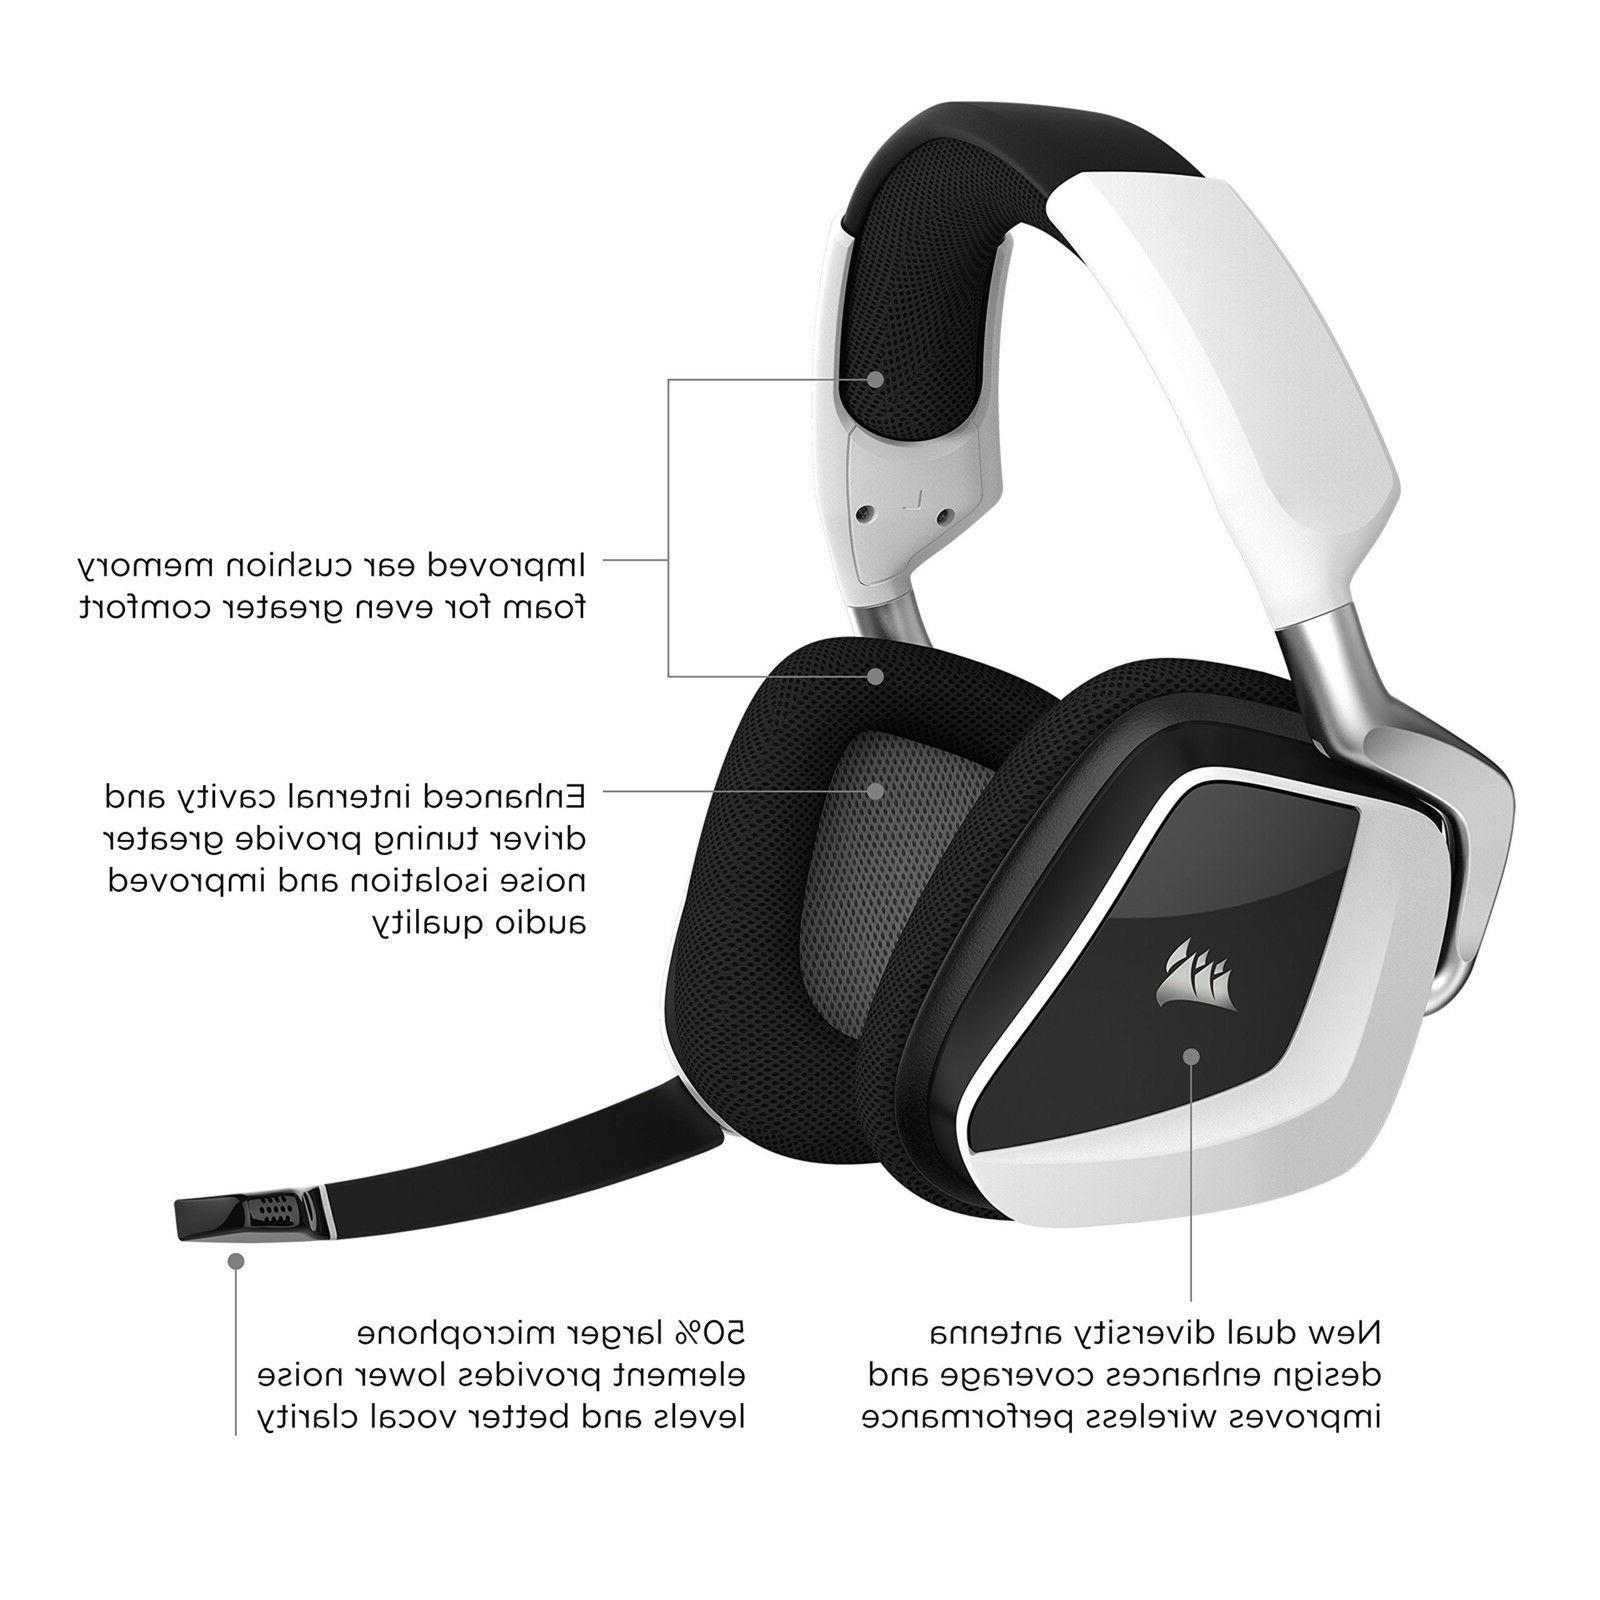 PRO Headphone Sound PC Gaming